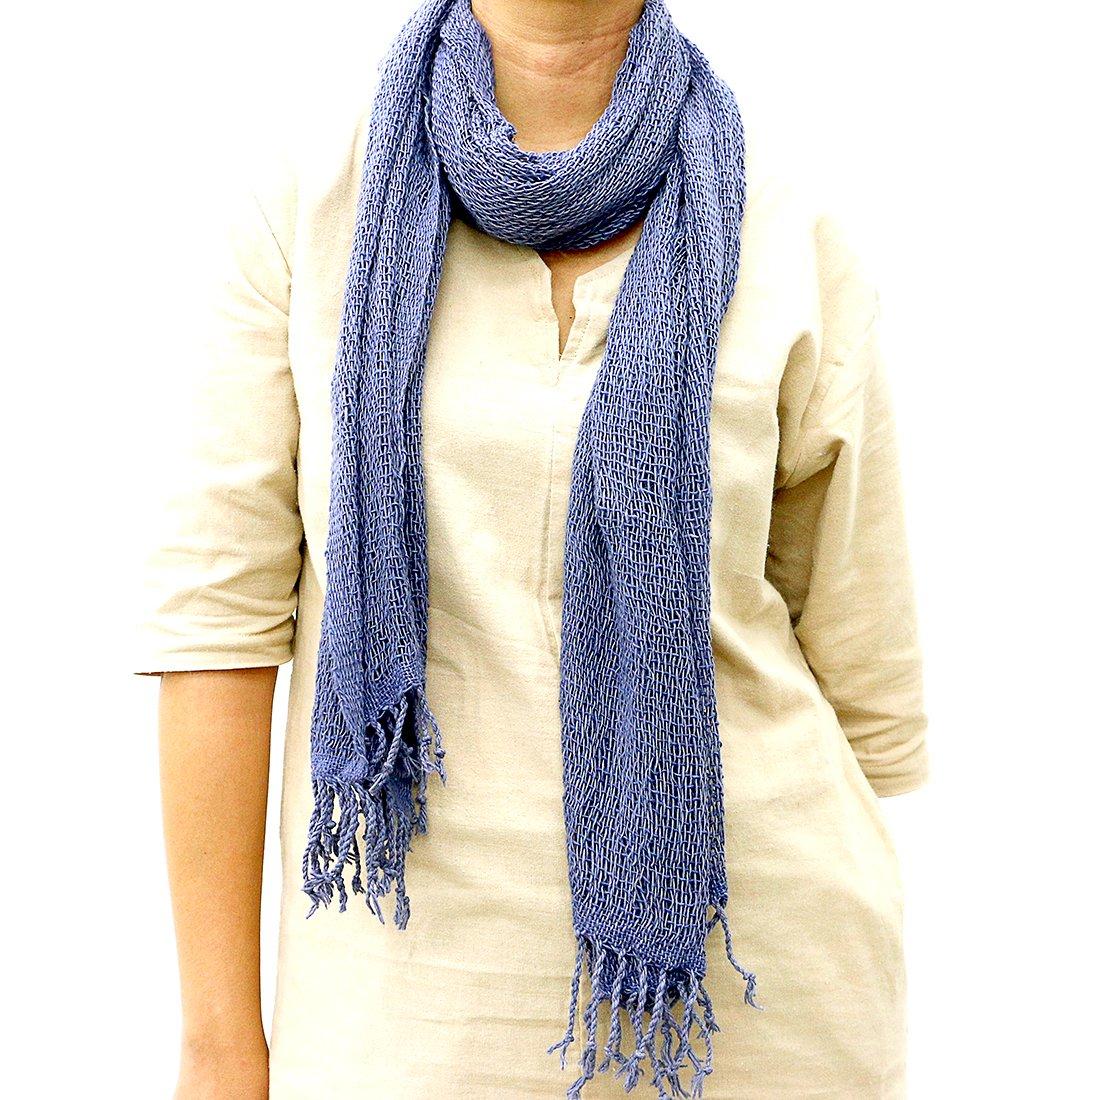 Taruron Woven Net Cotton Plain or Multi Colors Summer fashionable Scarf (Navy Blue)